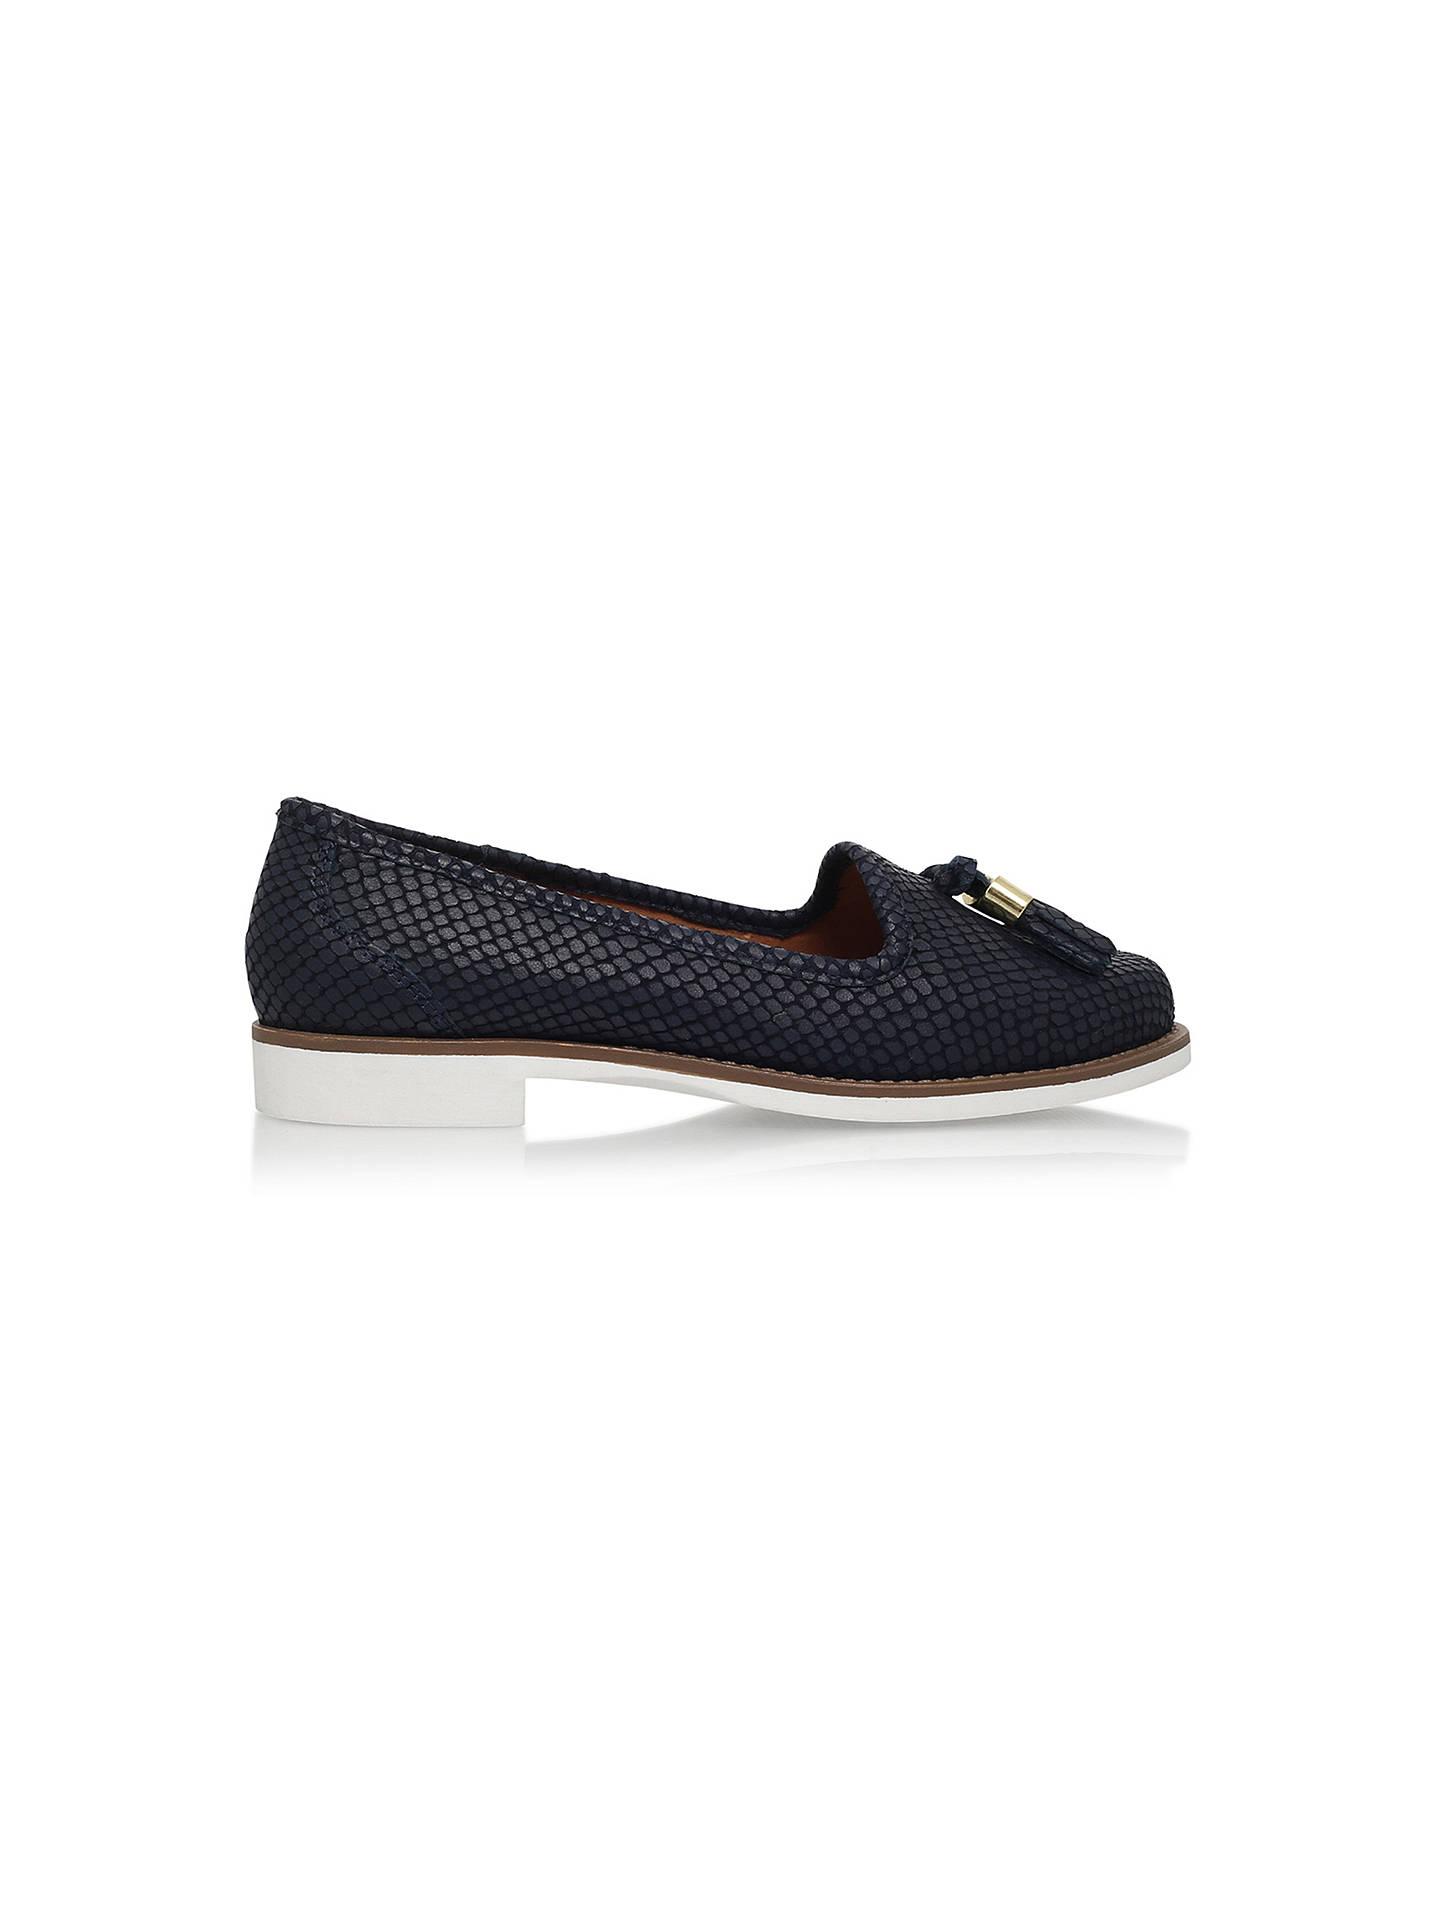 53612db902c Carvela Match Tassel Loafers at John Lewis   Partners